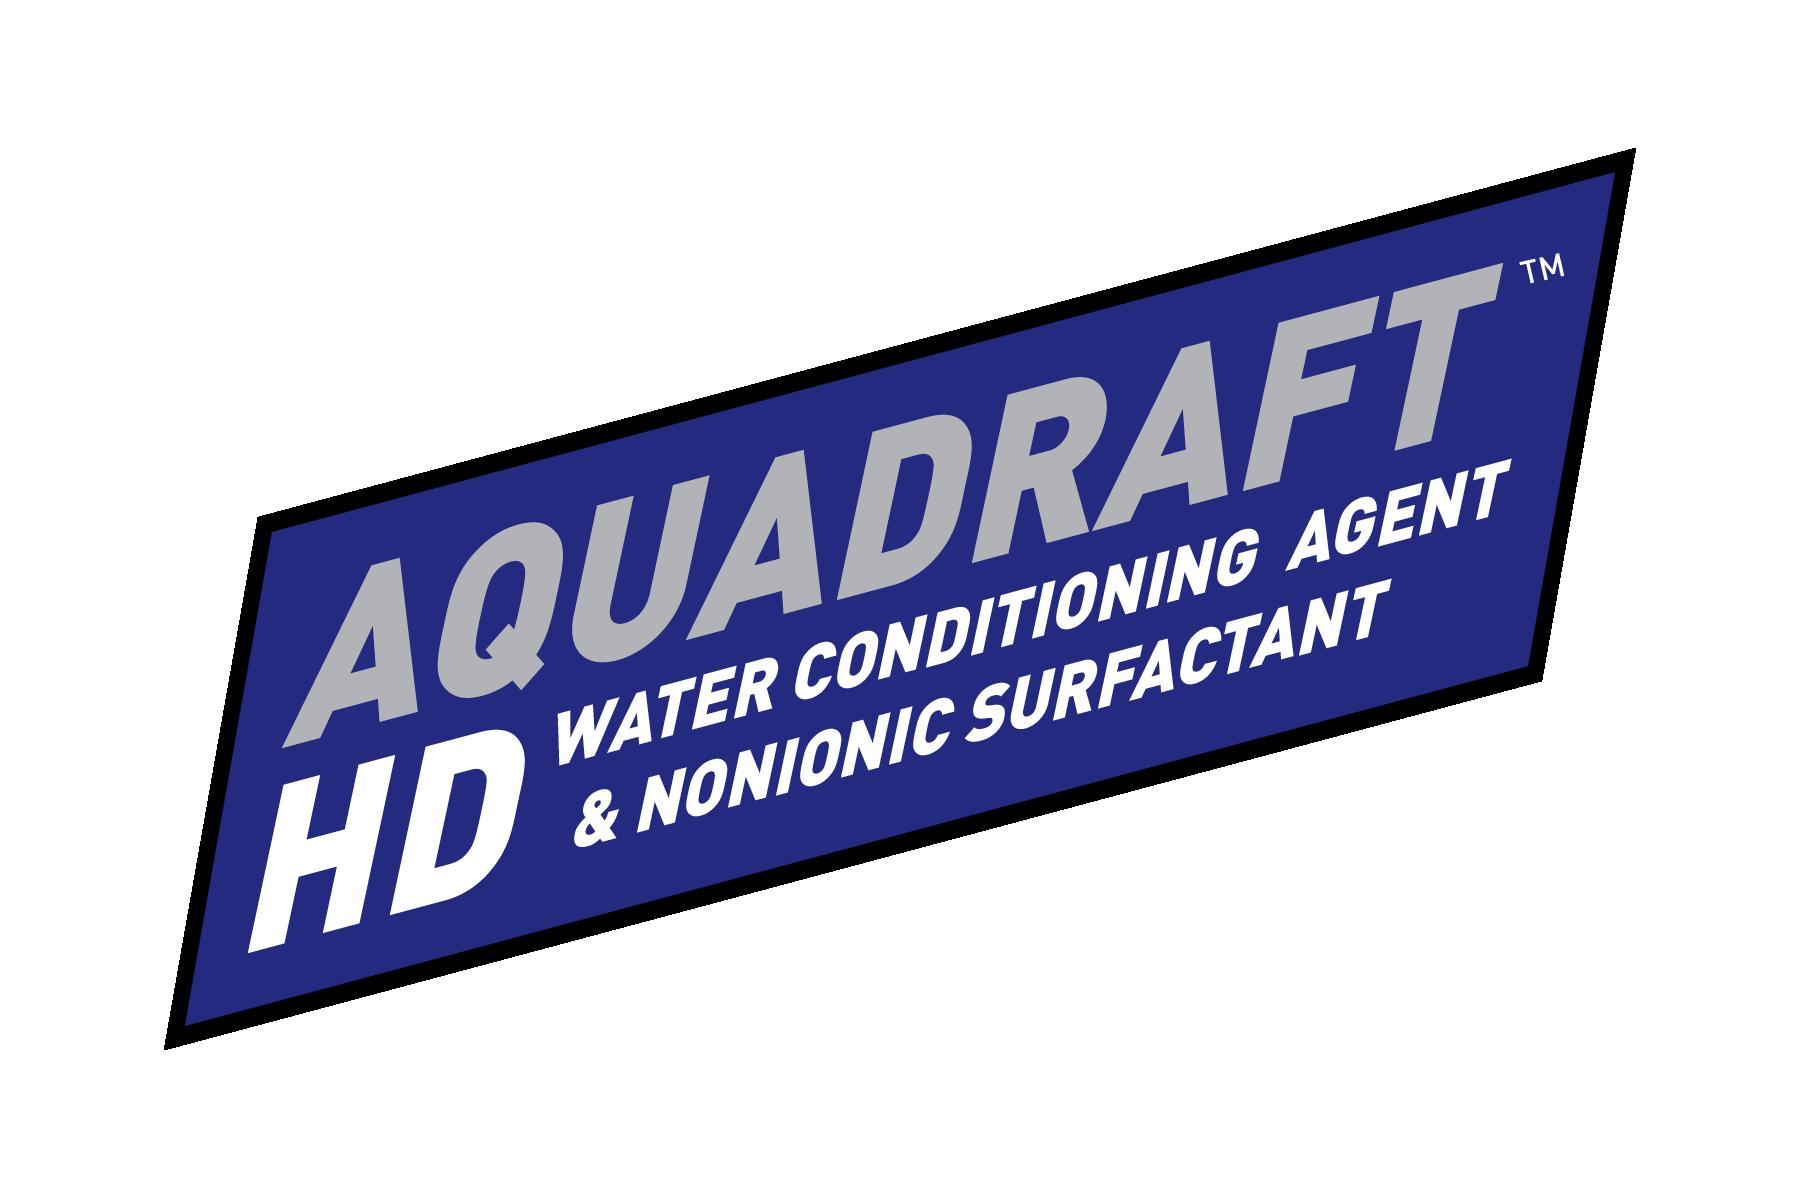 AQUADRAFT™ HD